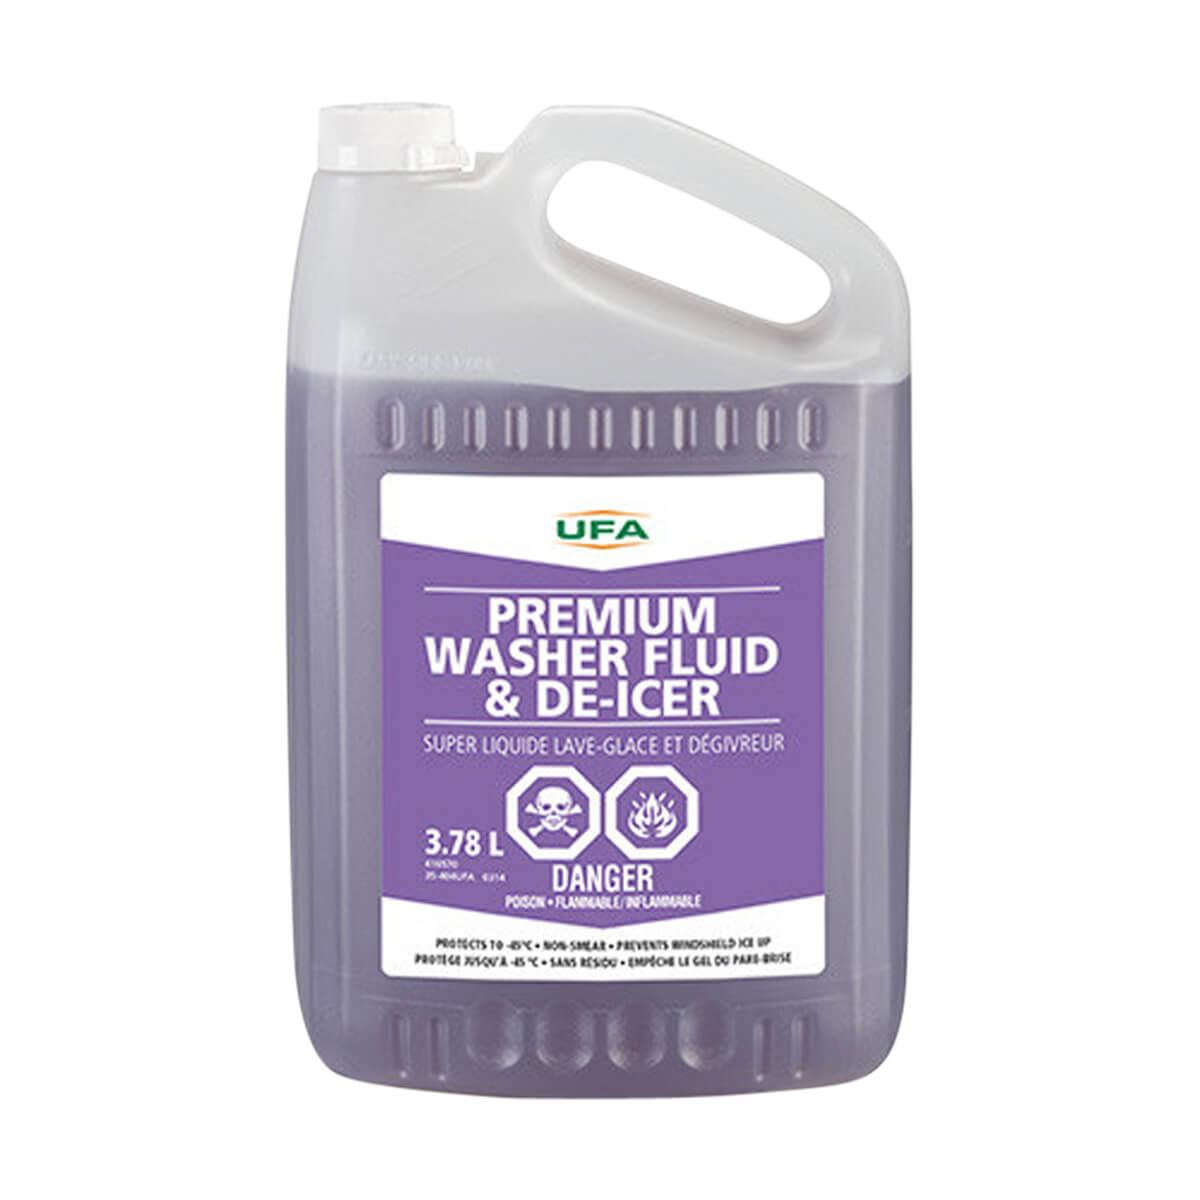 Premium -45 Washer Fluid & De-Icer - 3.78L